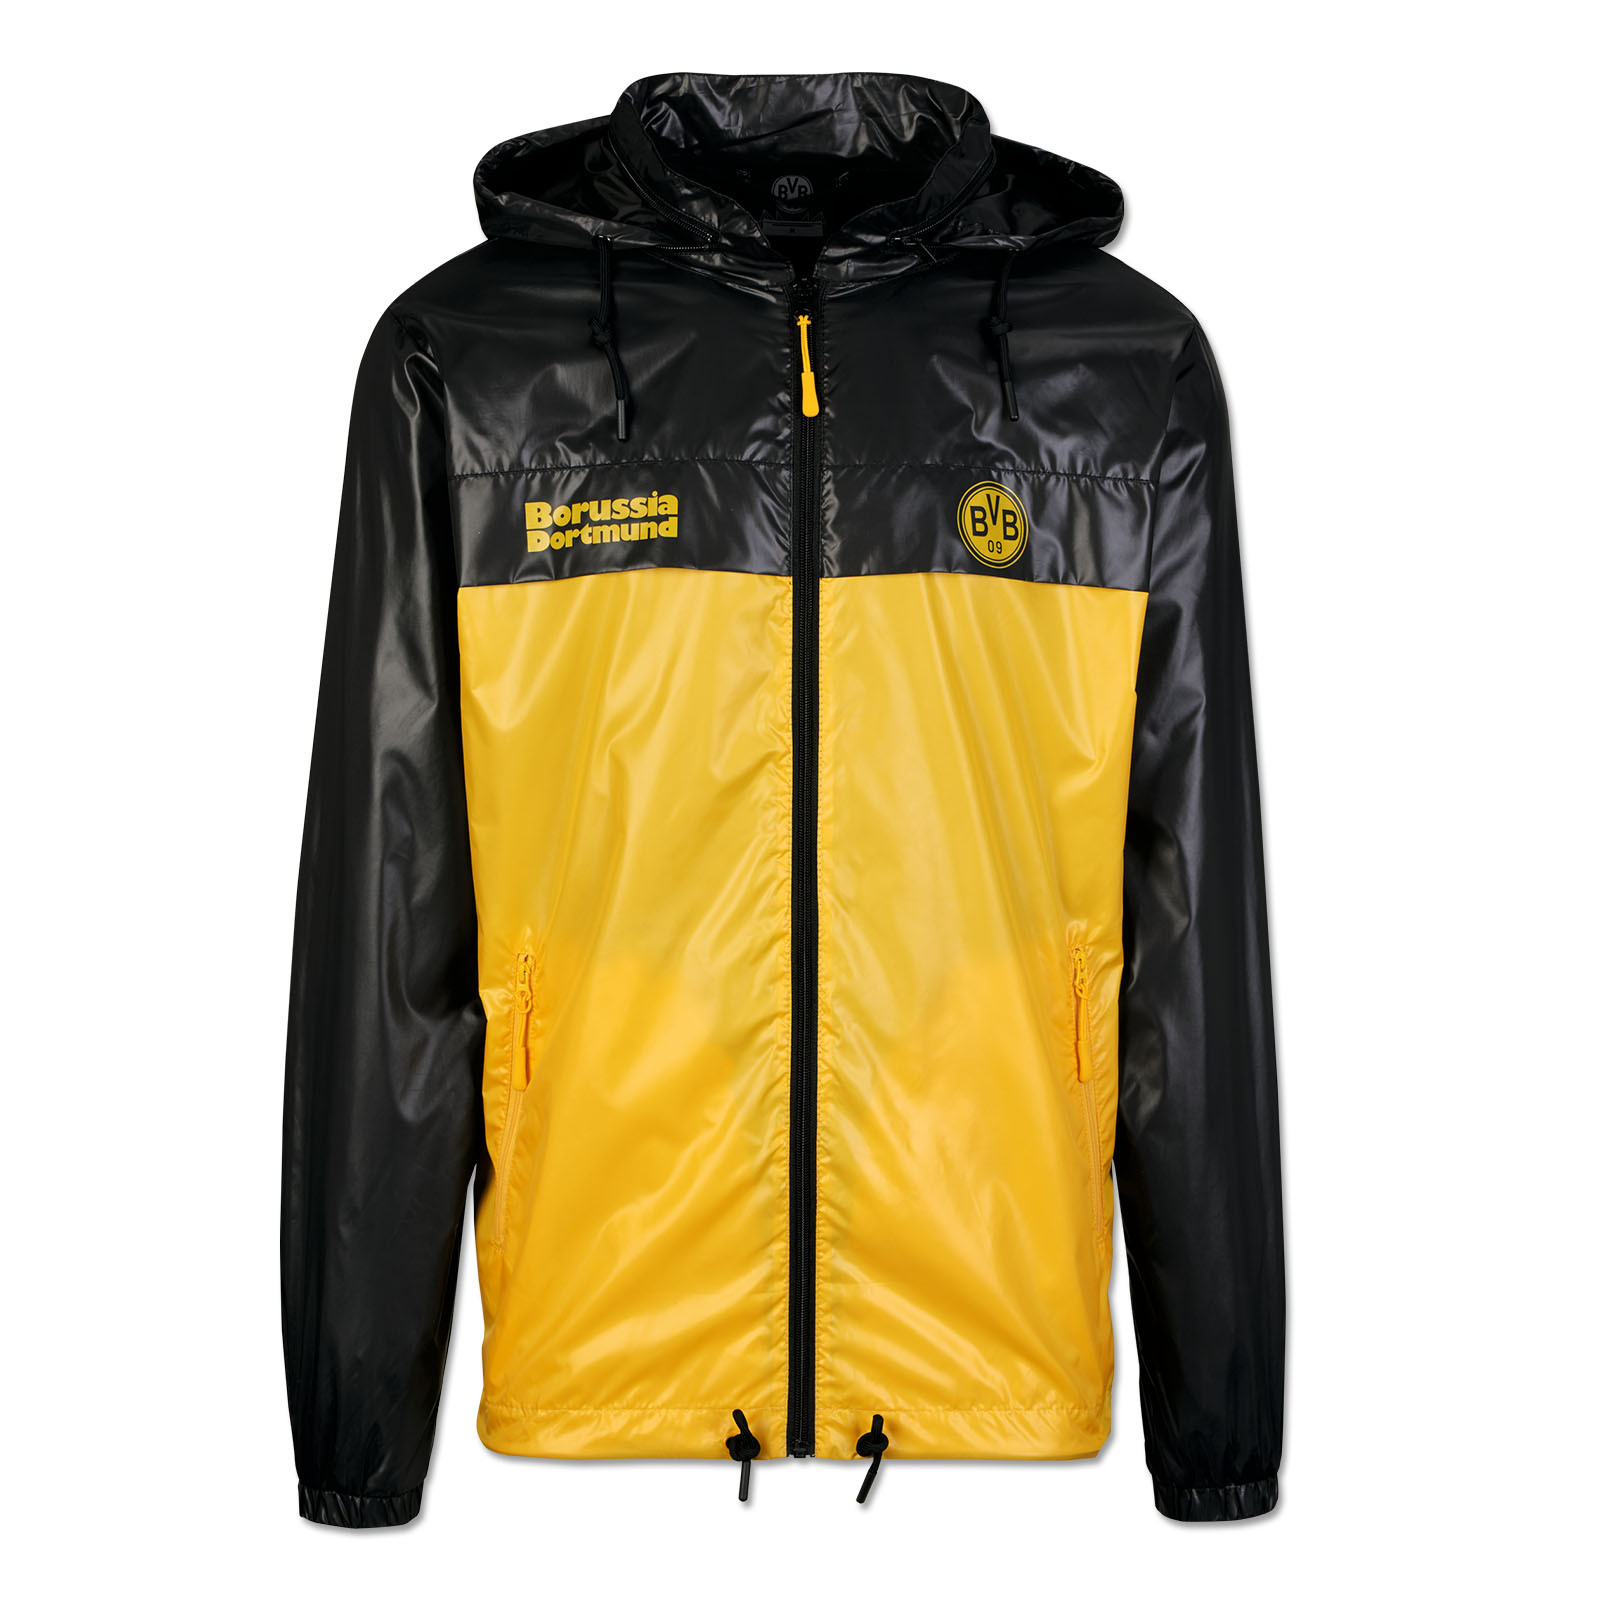 Pension compl/ète noir-jaune, stade Borussia Dortmund